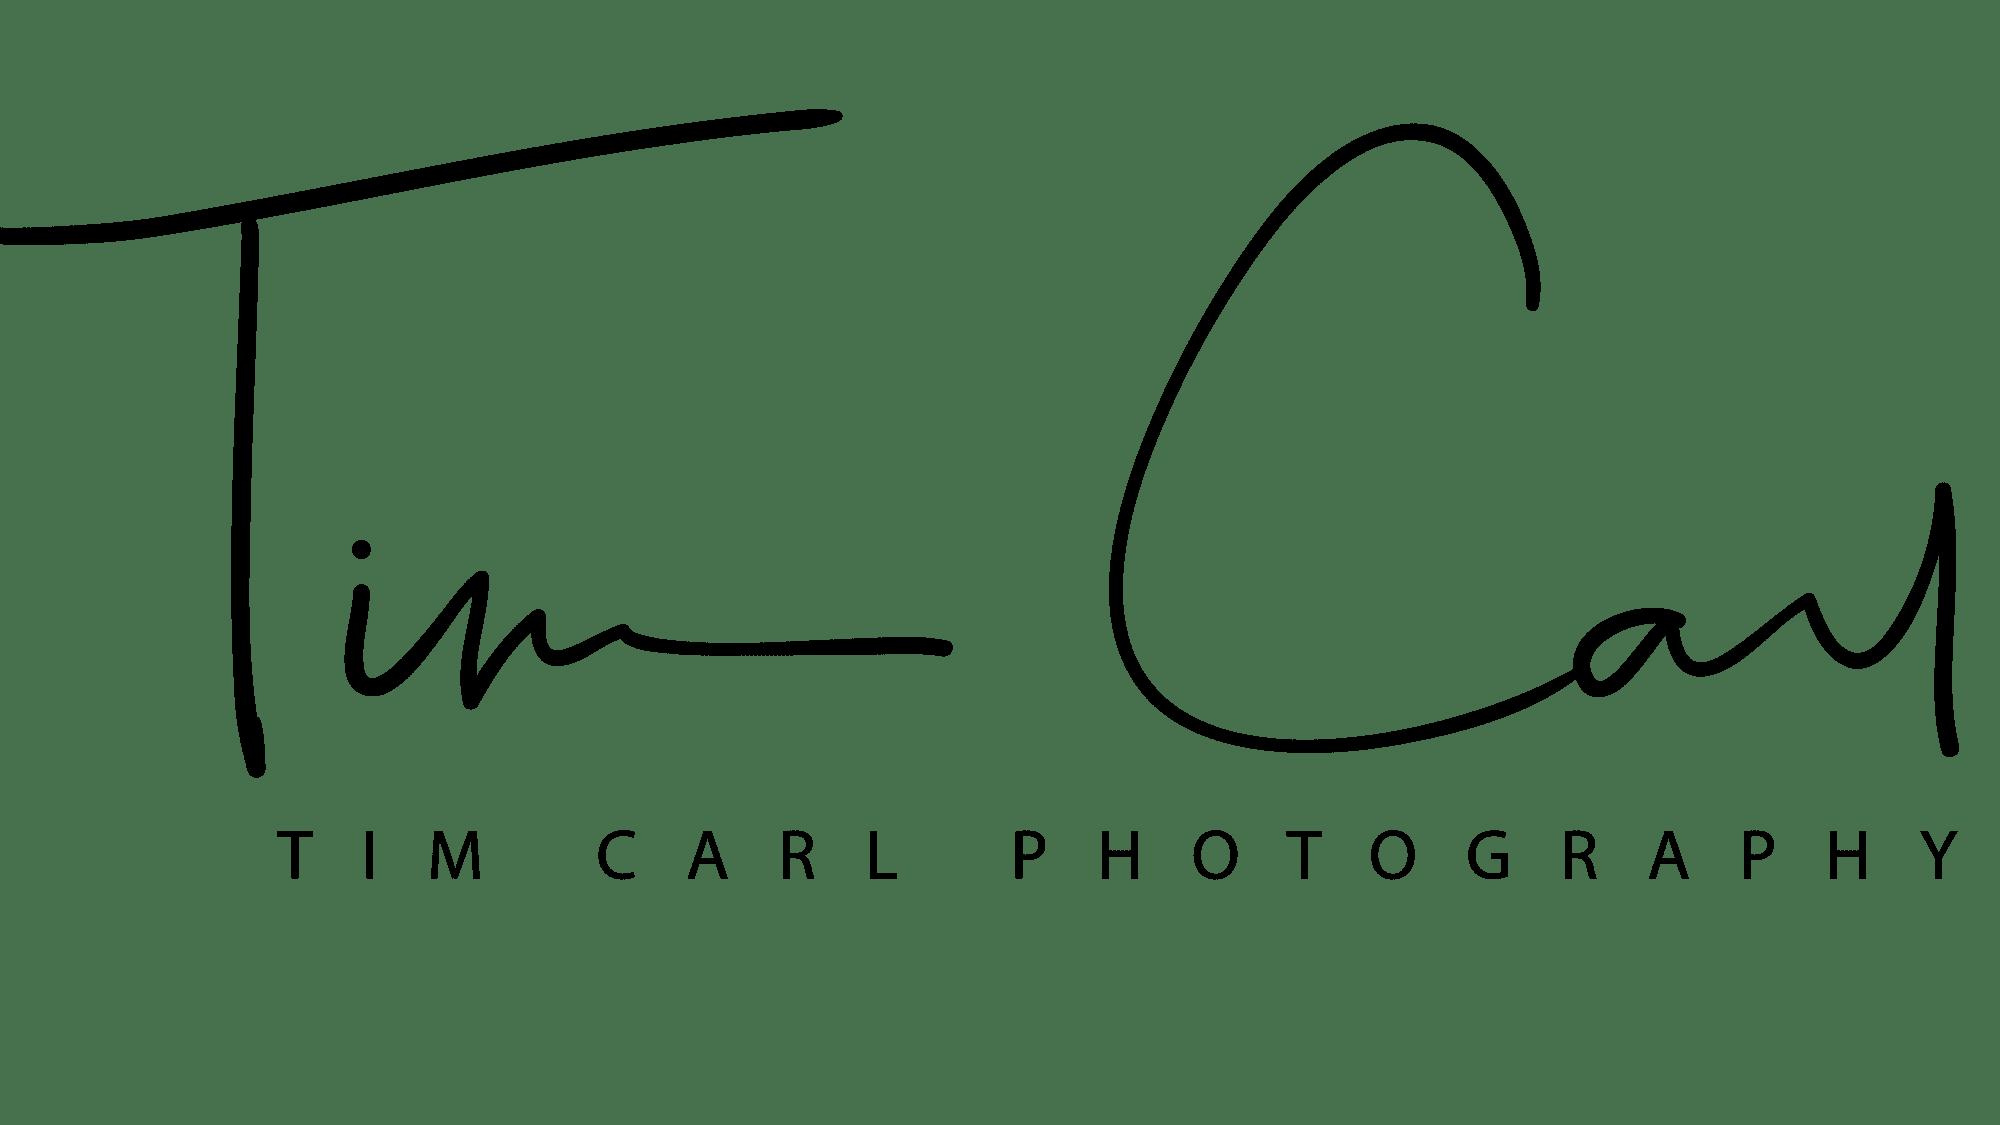 Tim Carl Photography